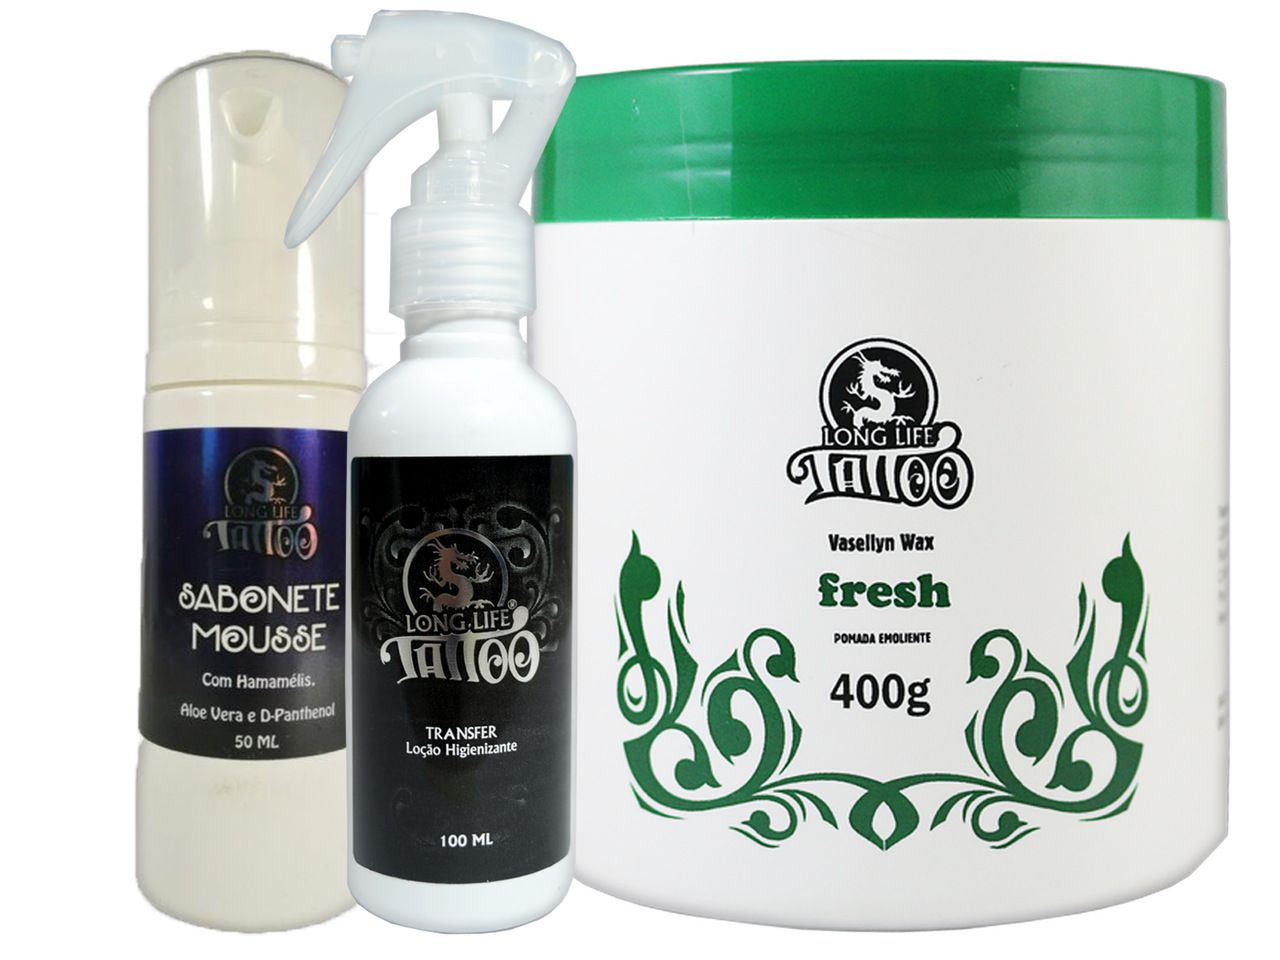 Sabonete Mousse 50 ml + Transfer Loção 100 ml + Vasellyn Wax Fresh 400g